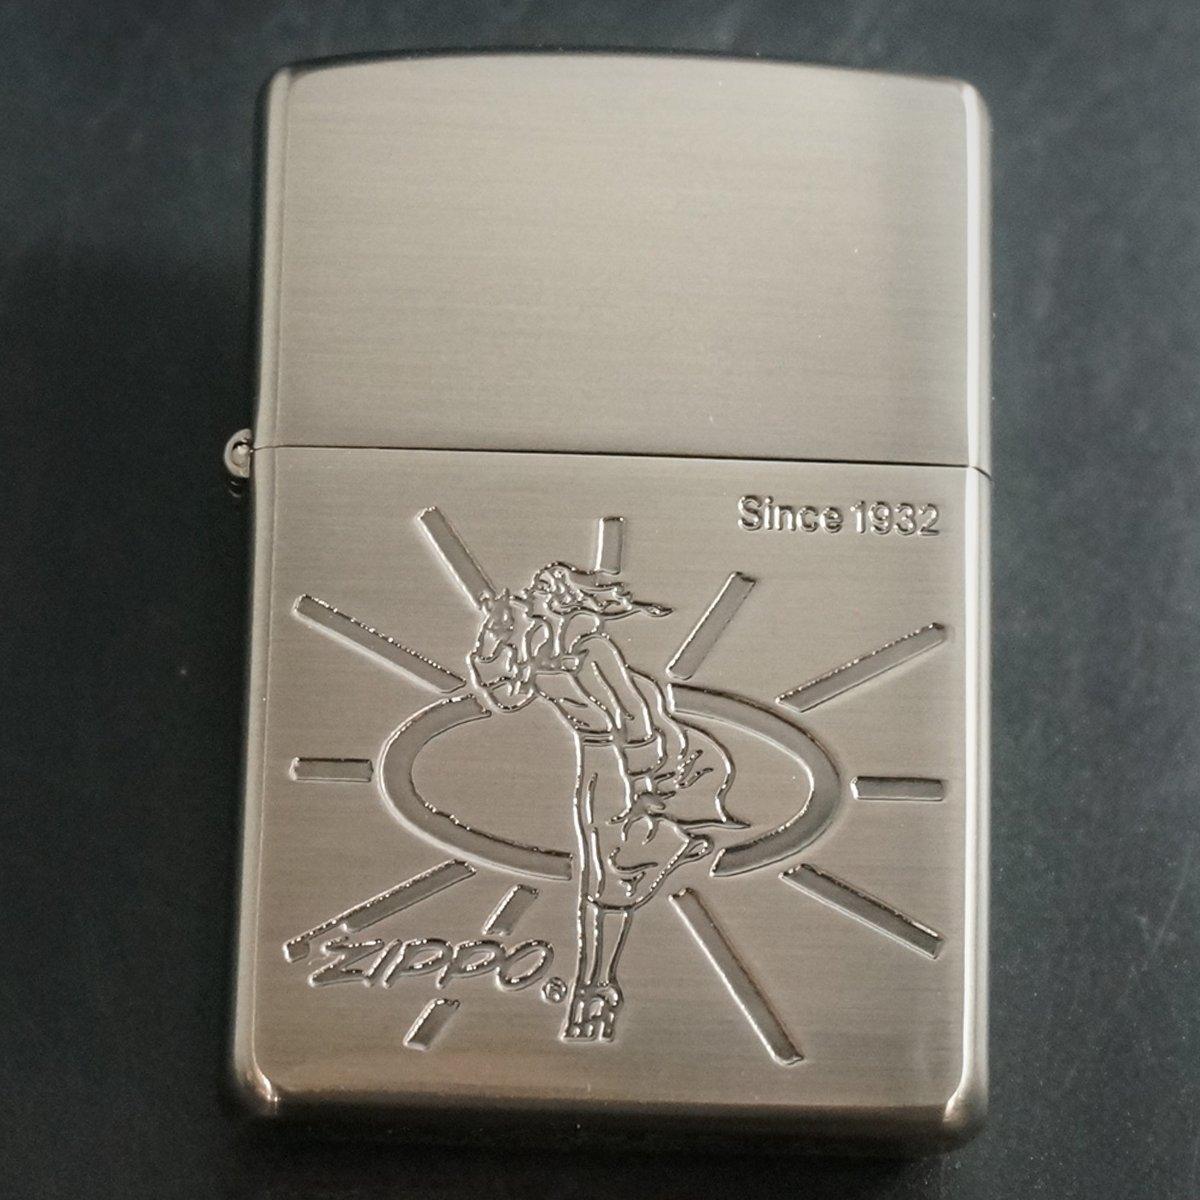 zippo WINDY エッチング シルバーいぶし B 2000年製造 B06XDYY9D6